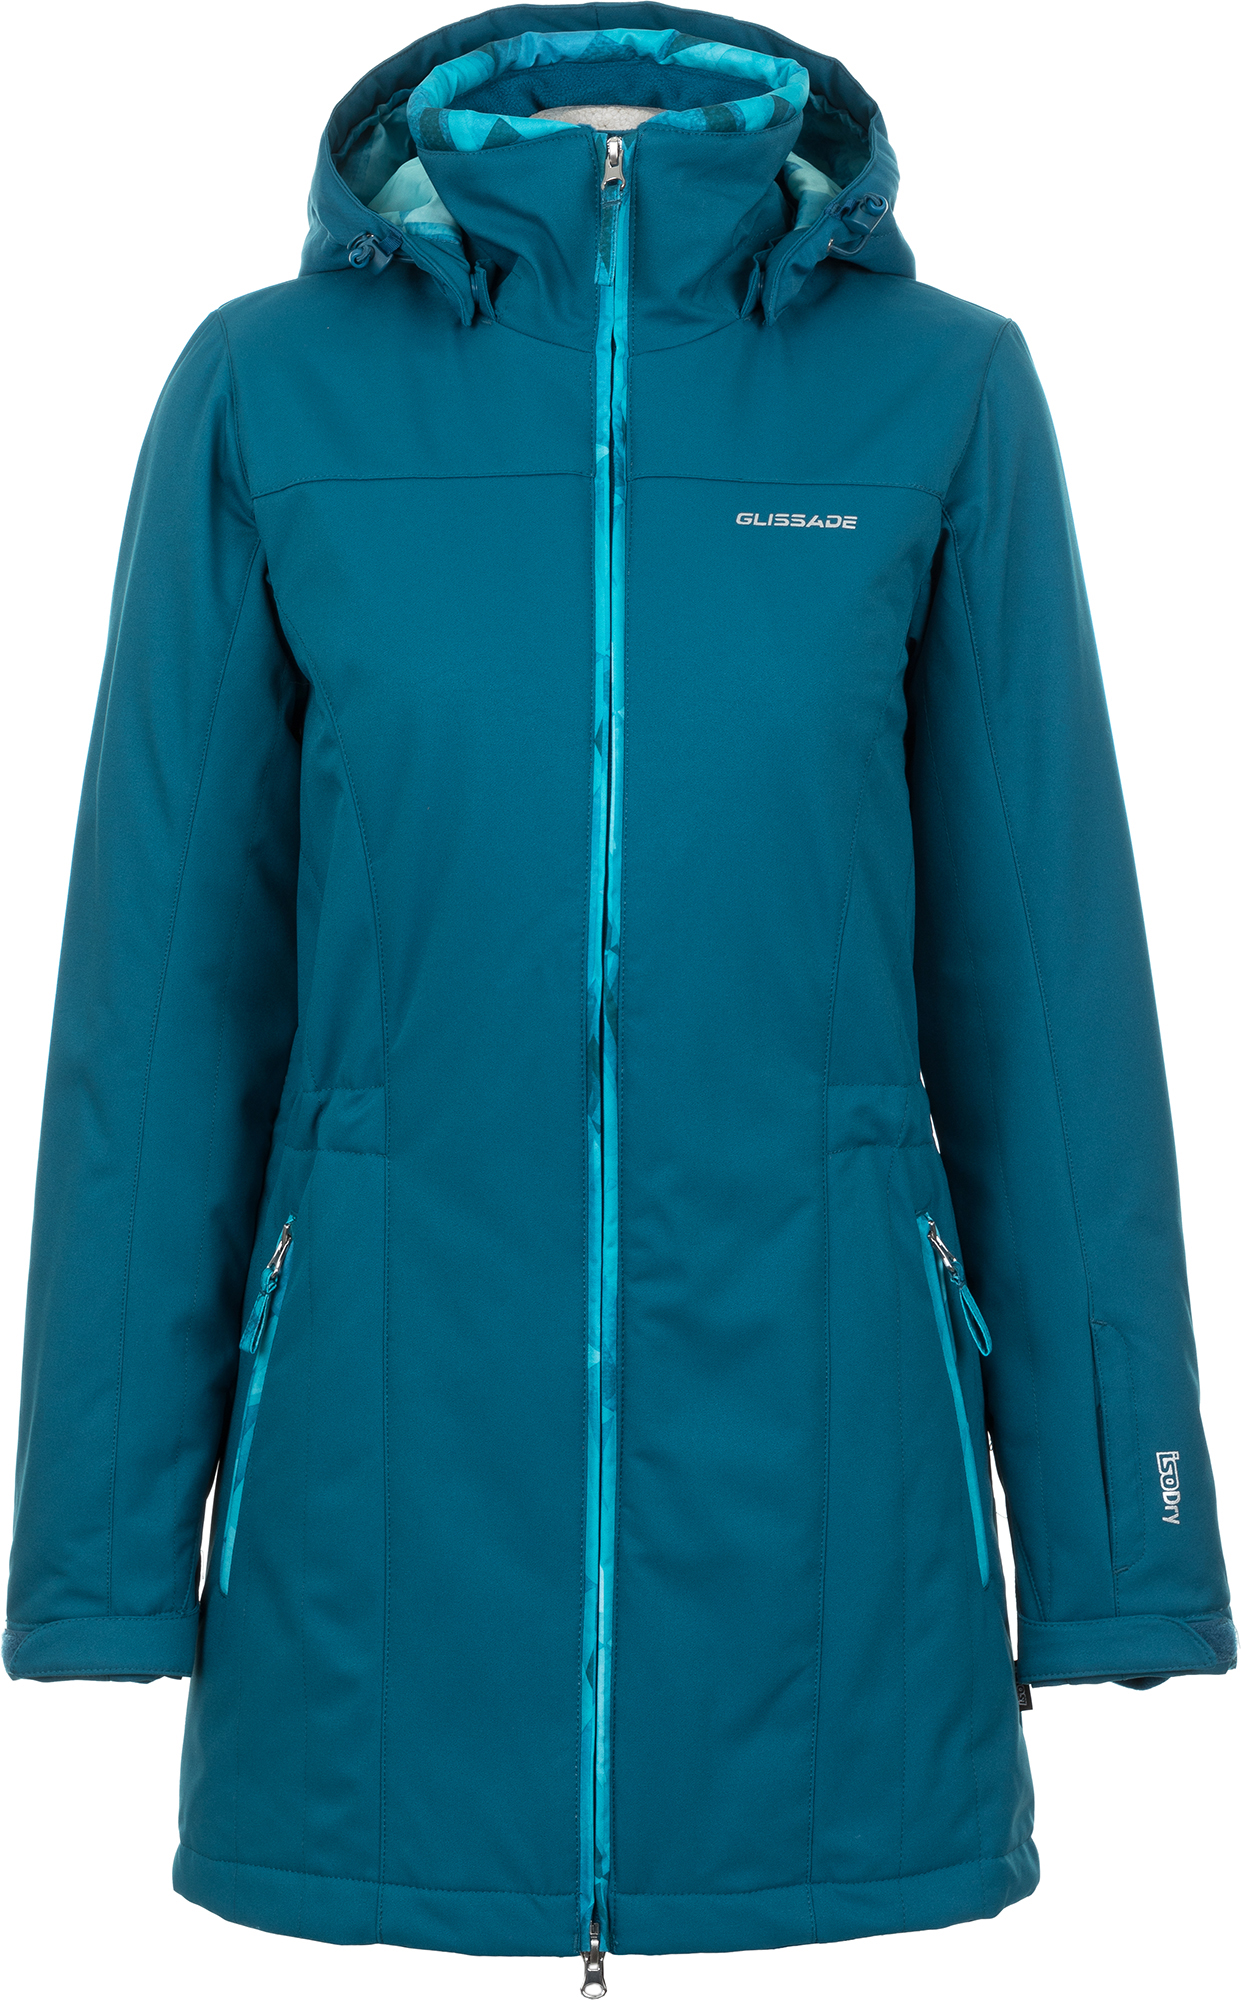 Glissade Куртка утепленная женская Glissade, размер 56 prada утепленная куртка на молнии